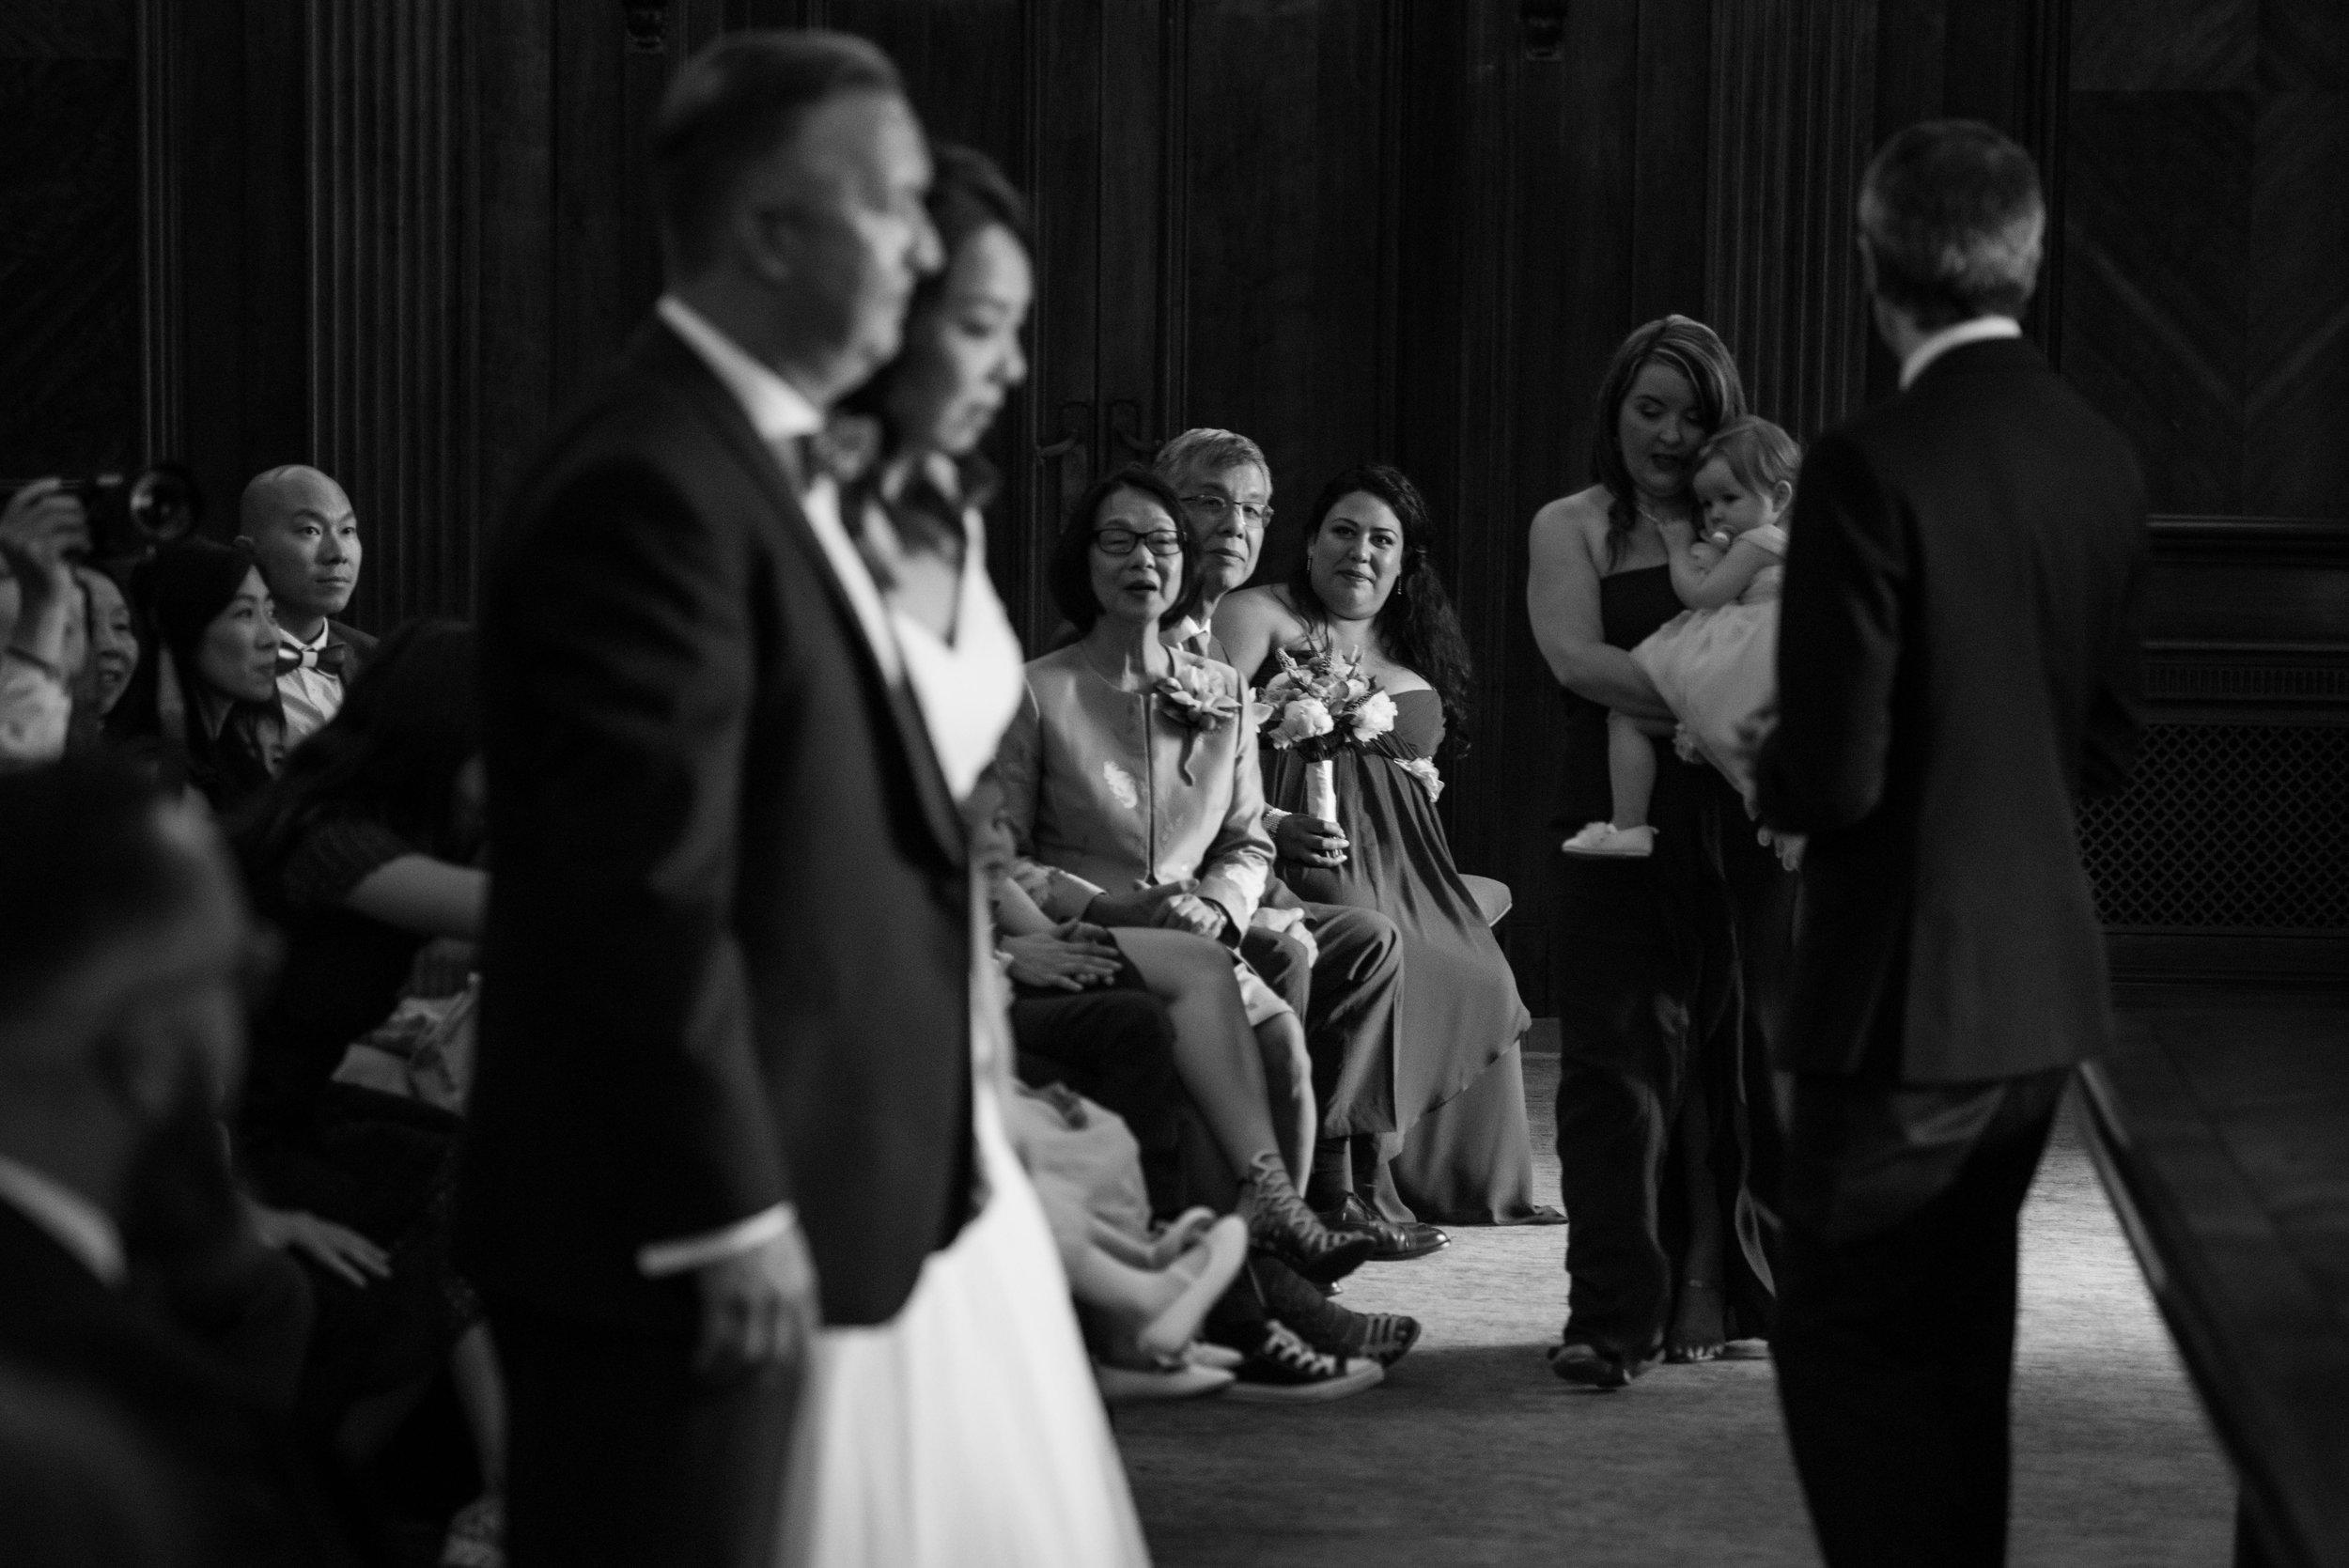 D&M_Marylebone Town Hall Wedding (109 of 239).jpg